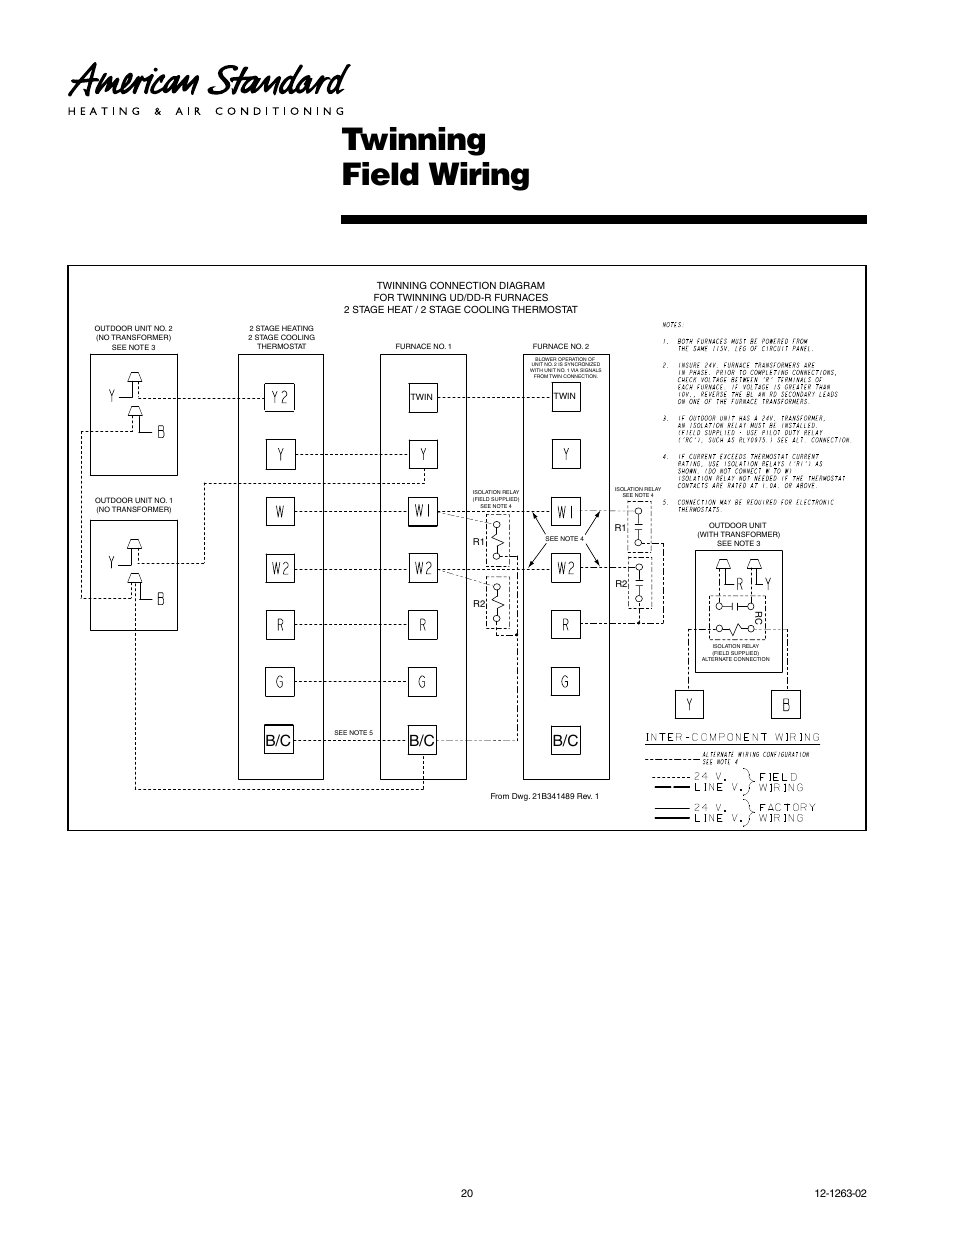 Twinning Field Wiring